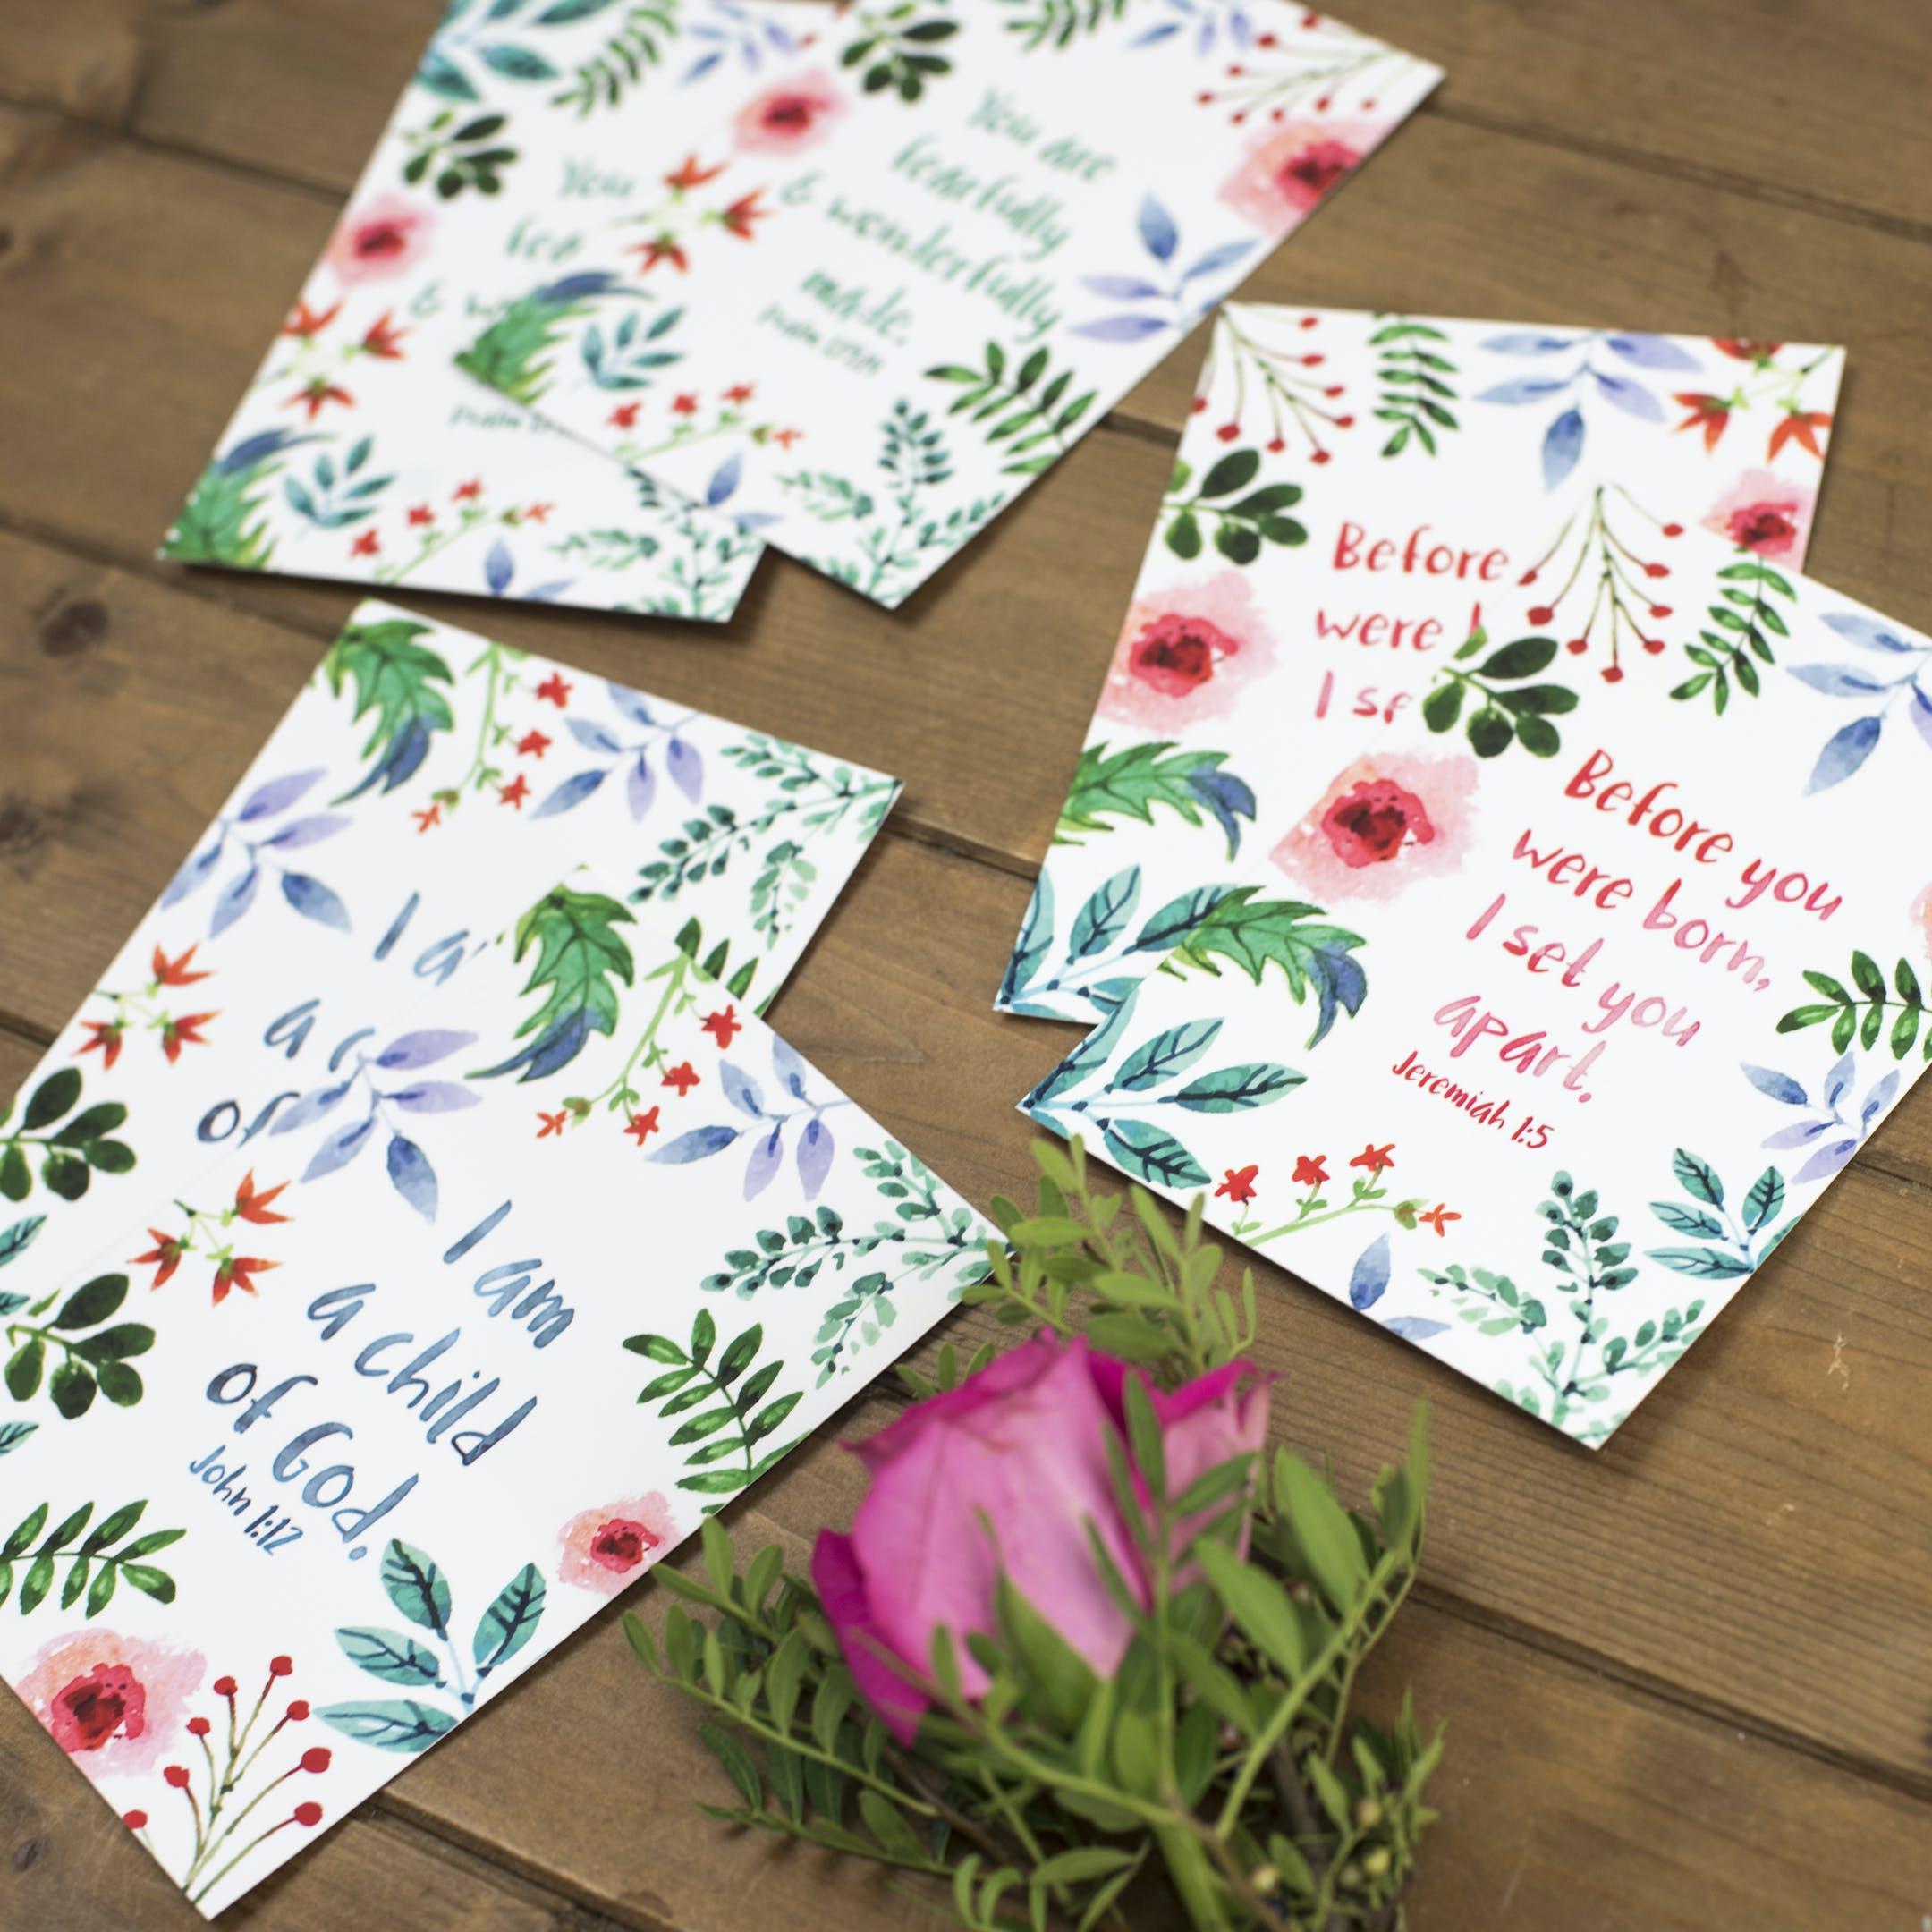 Set of 6 Floral Encouragement Postcards - Izzy and Pop